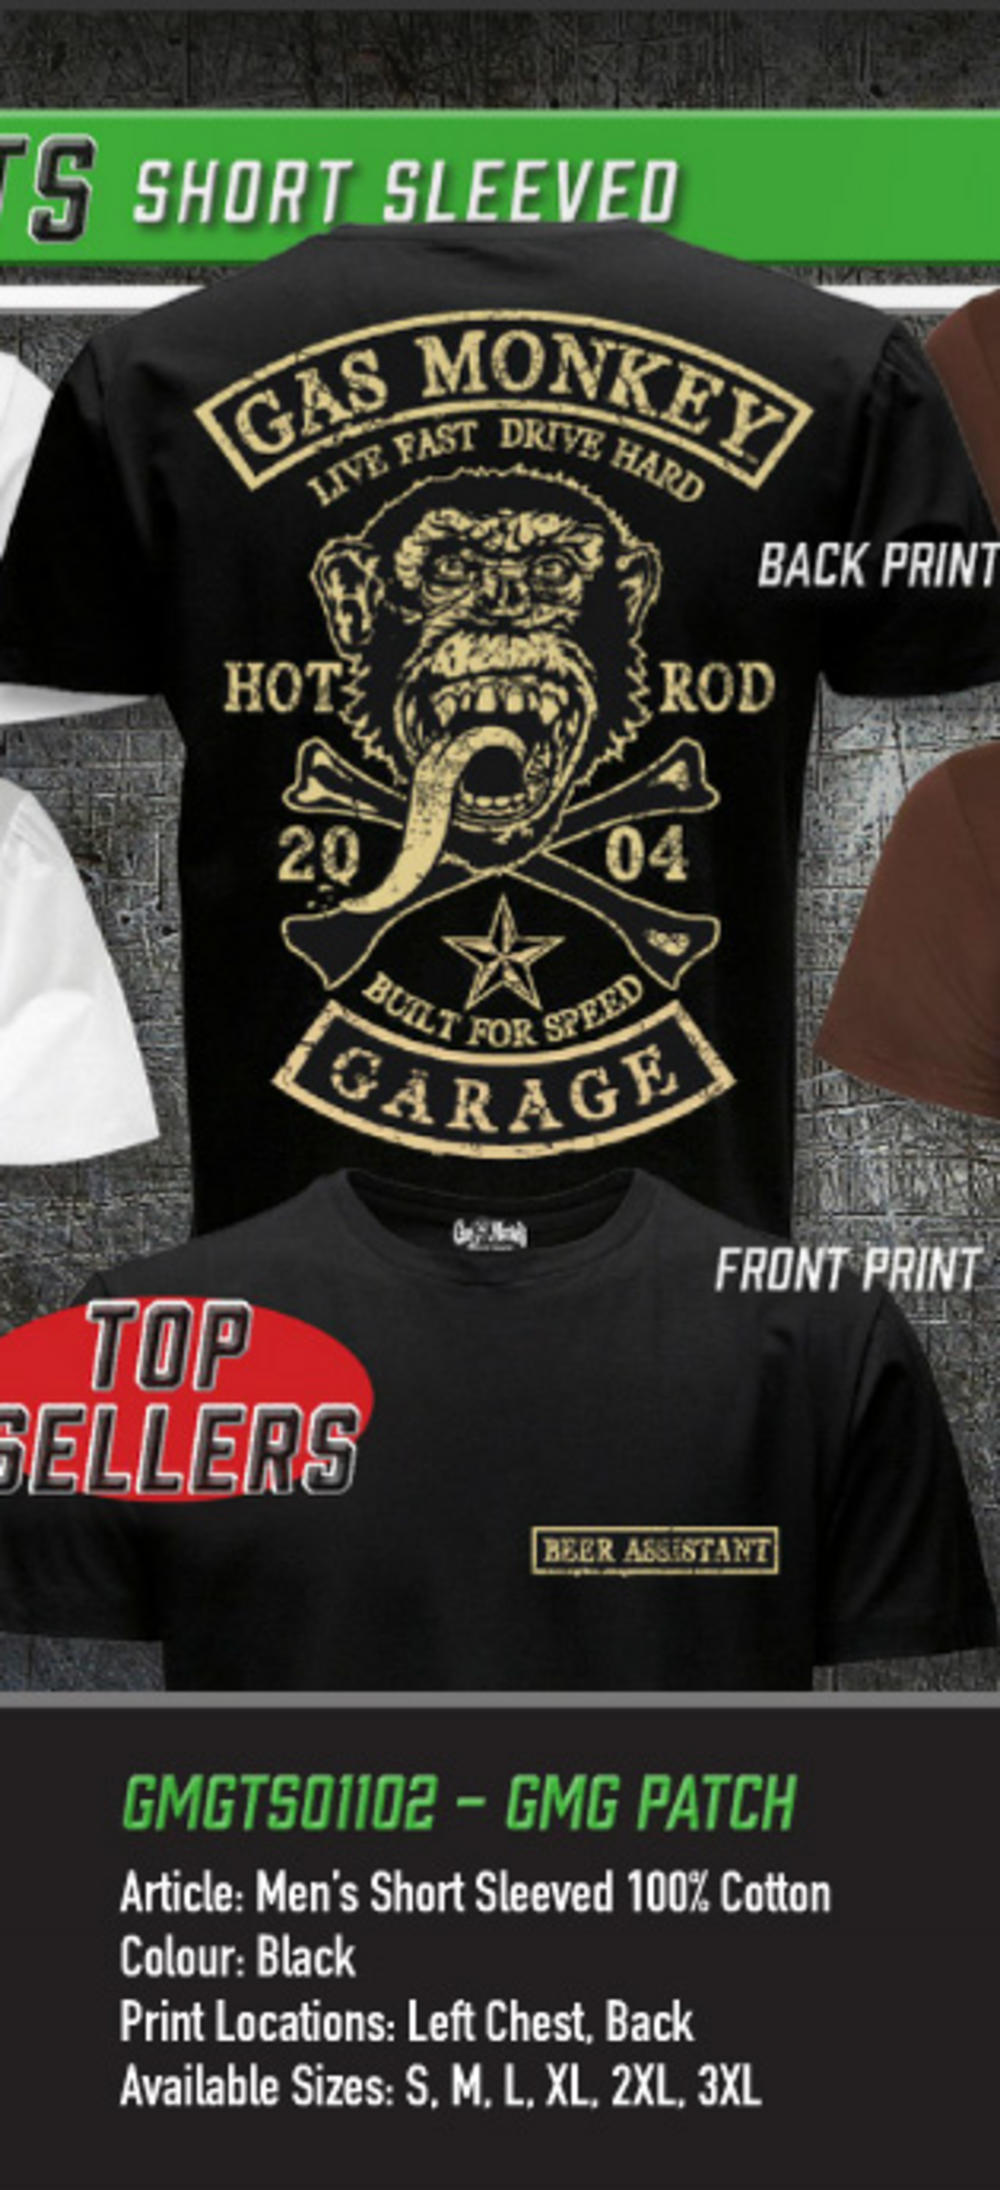 Officially Licensed Gas Monkey Garage Big Patch Women/'s T-Shirt S-XXL Sizes